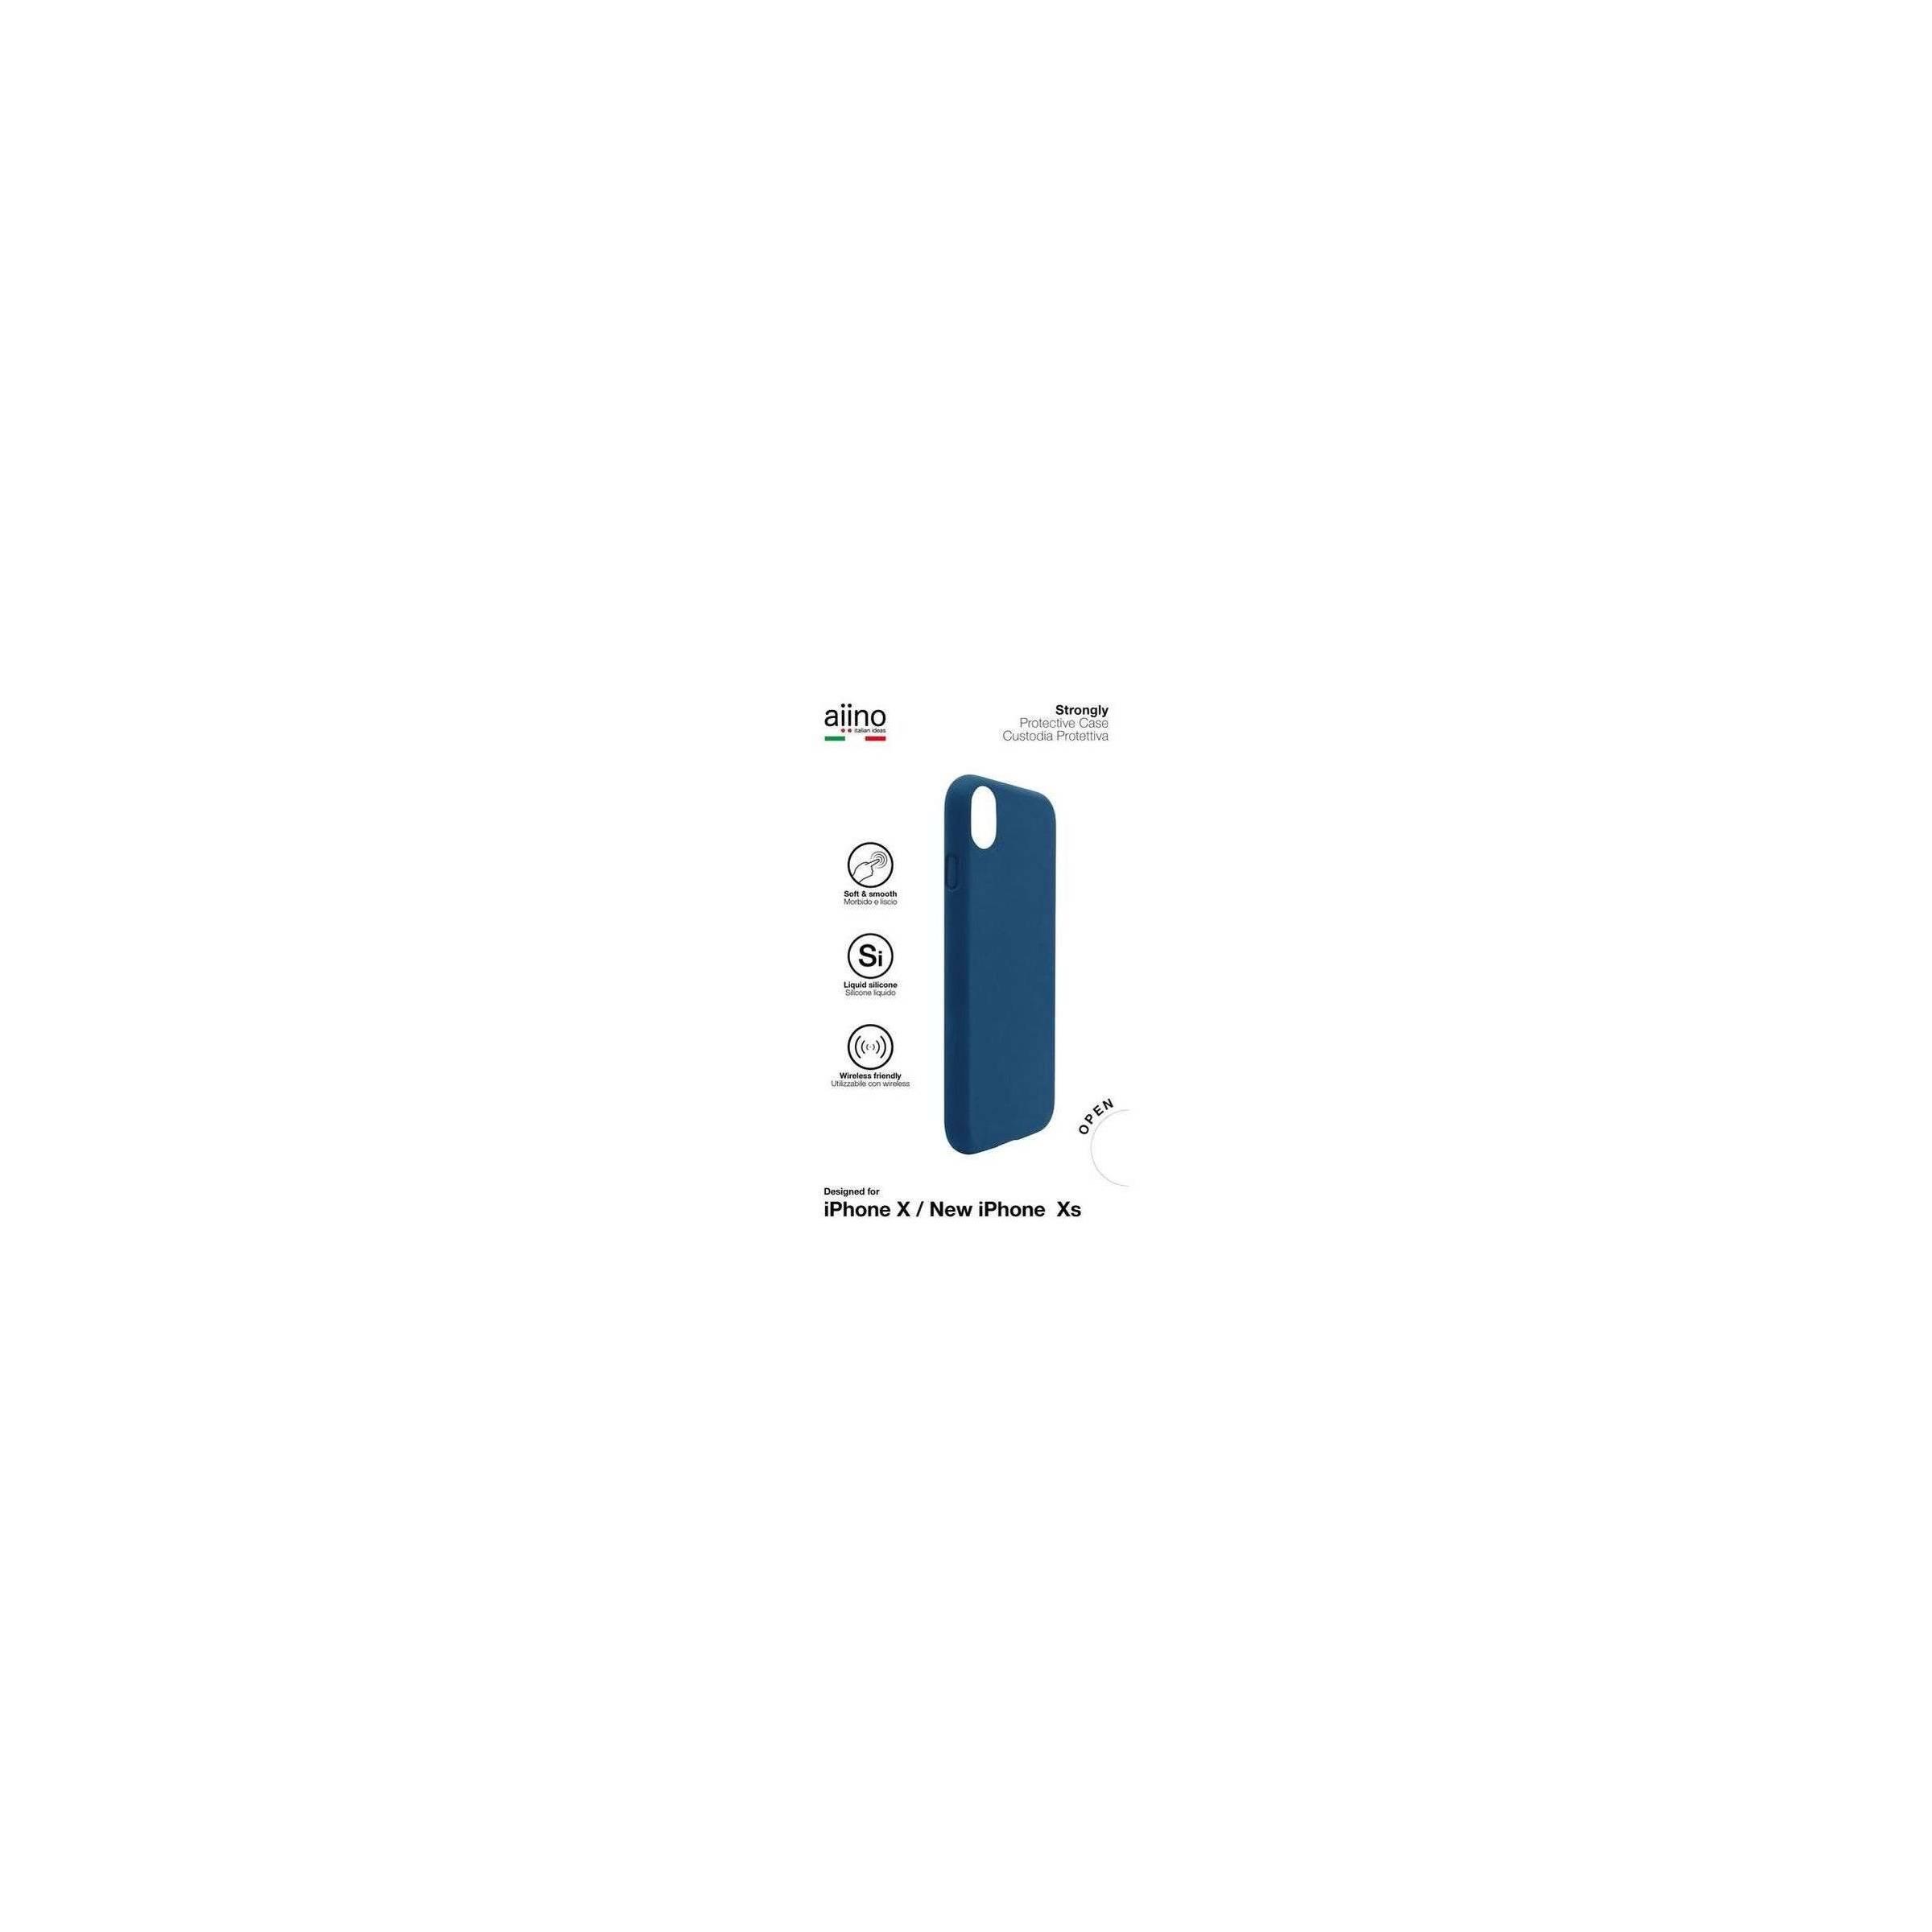 aiino – Aiino strongly premium cover til iphone x / xs farve mørke blå fra mackabler.dk